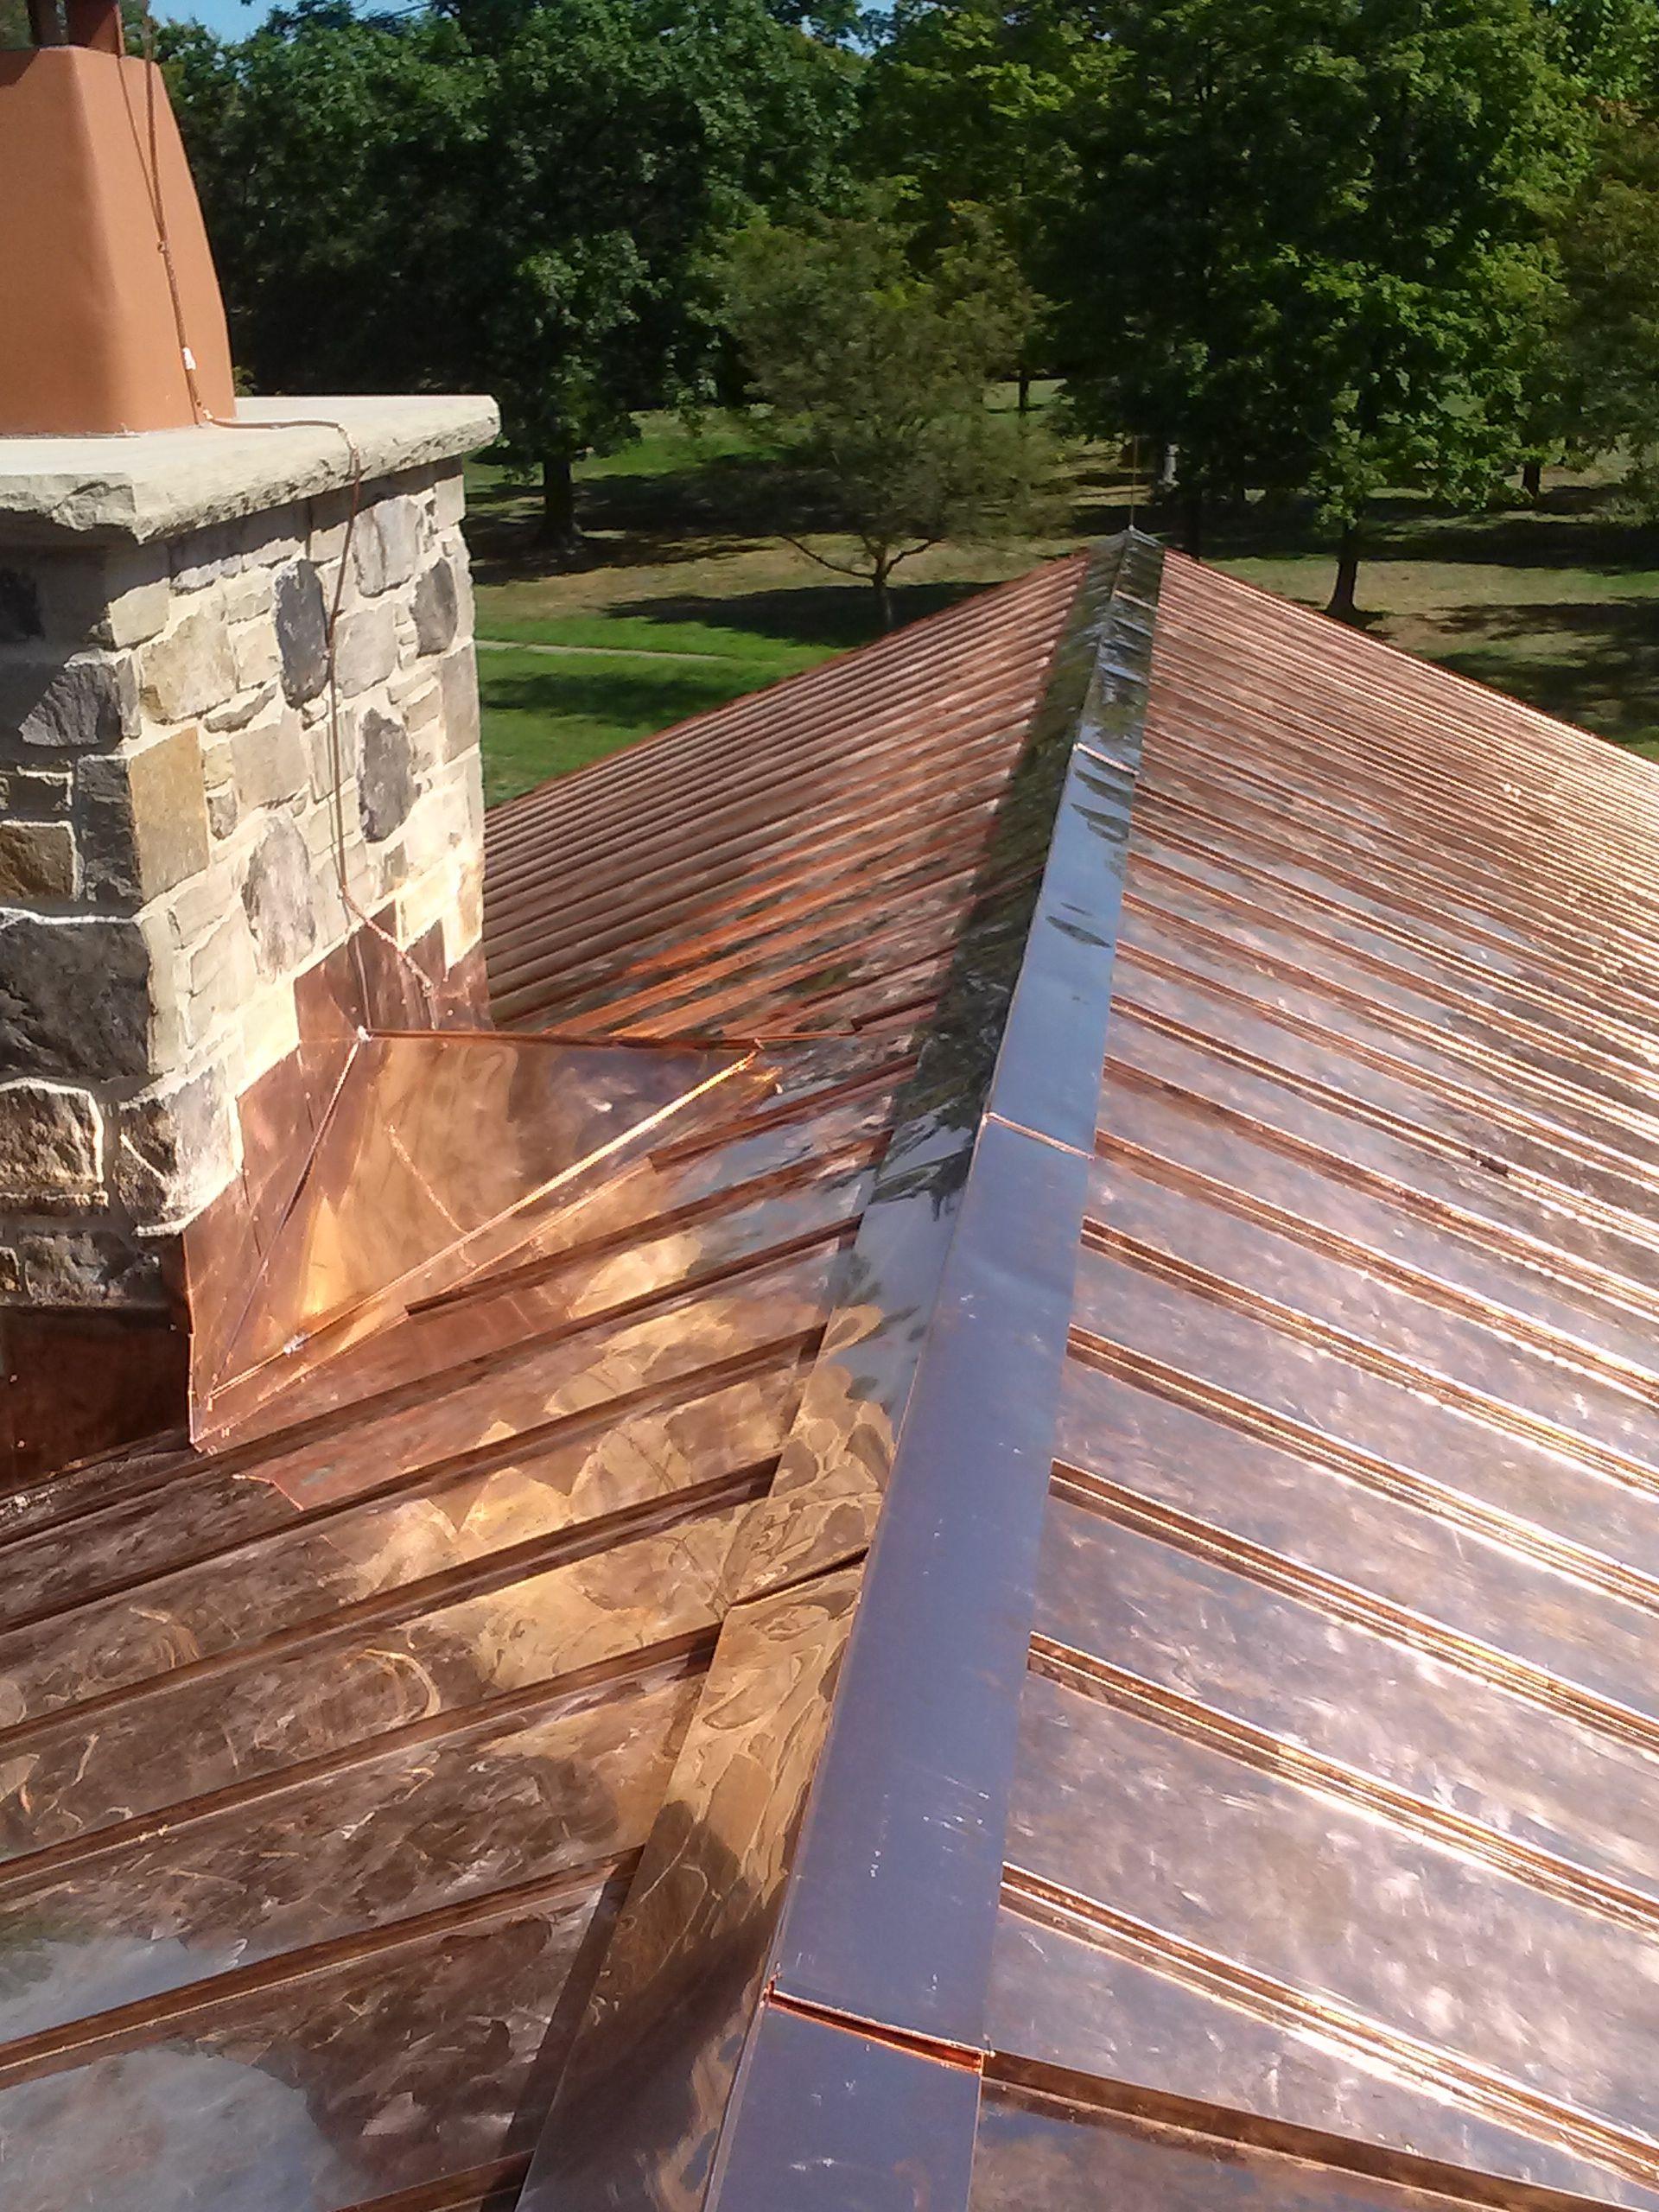 Pin By Alexandr Kucherenko On Metal Roof Copper Roof Roof Styles Outdoor Buildings